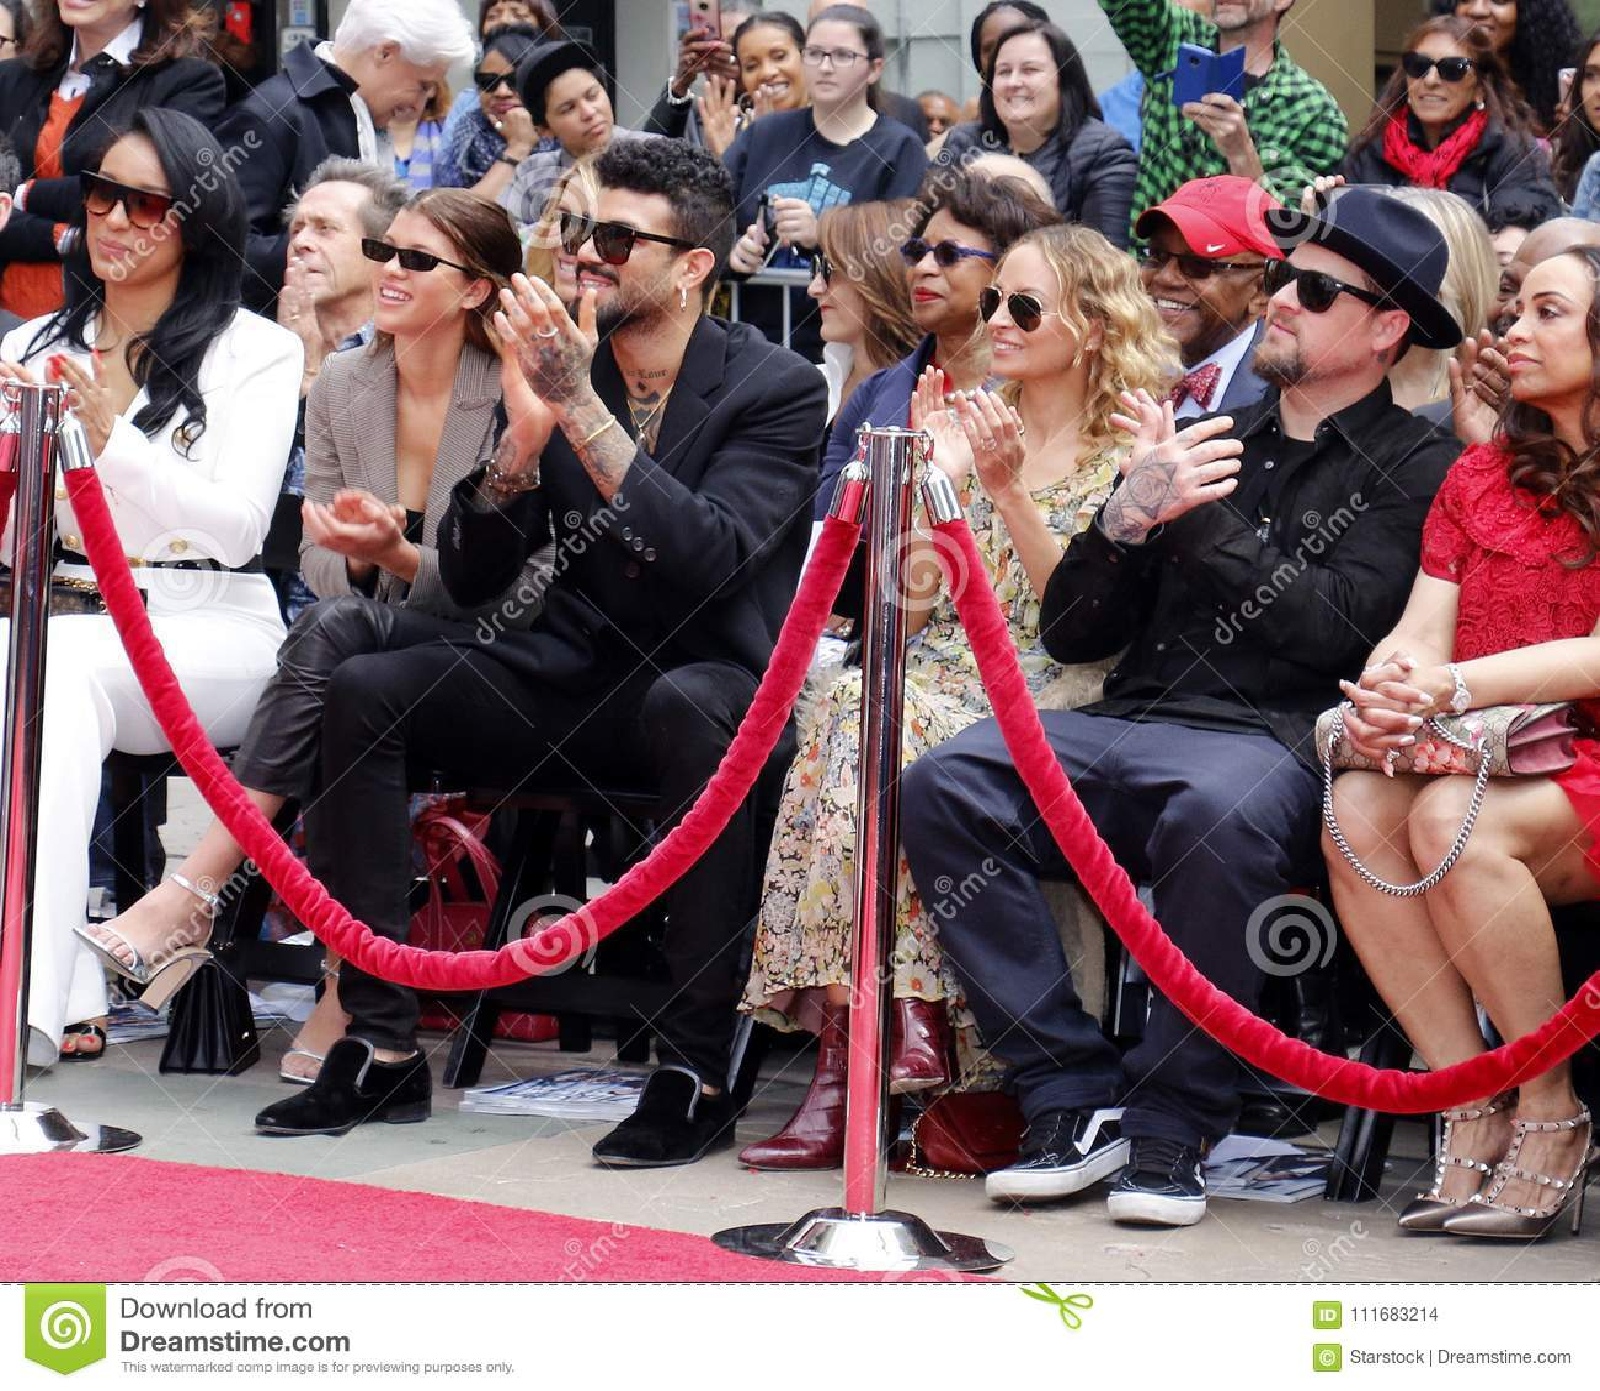 Sofia Richie, Miles Richie, Nicole Richie, Lisa Parigi y Benji Madden